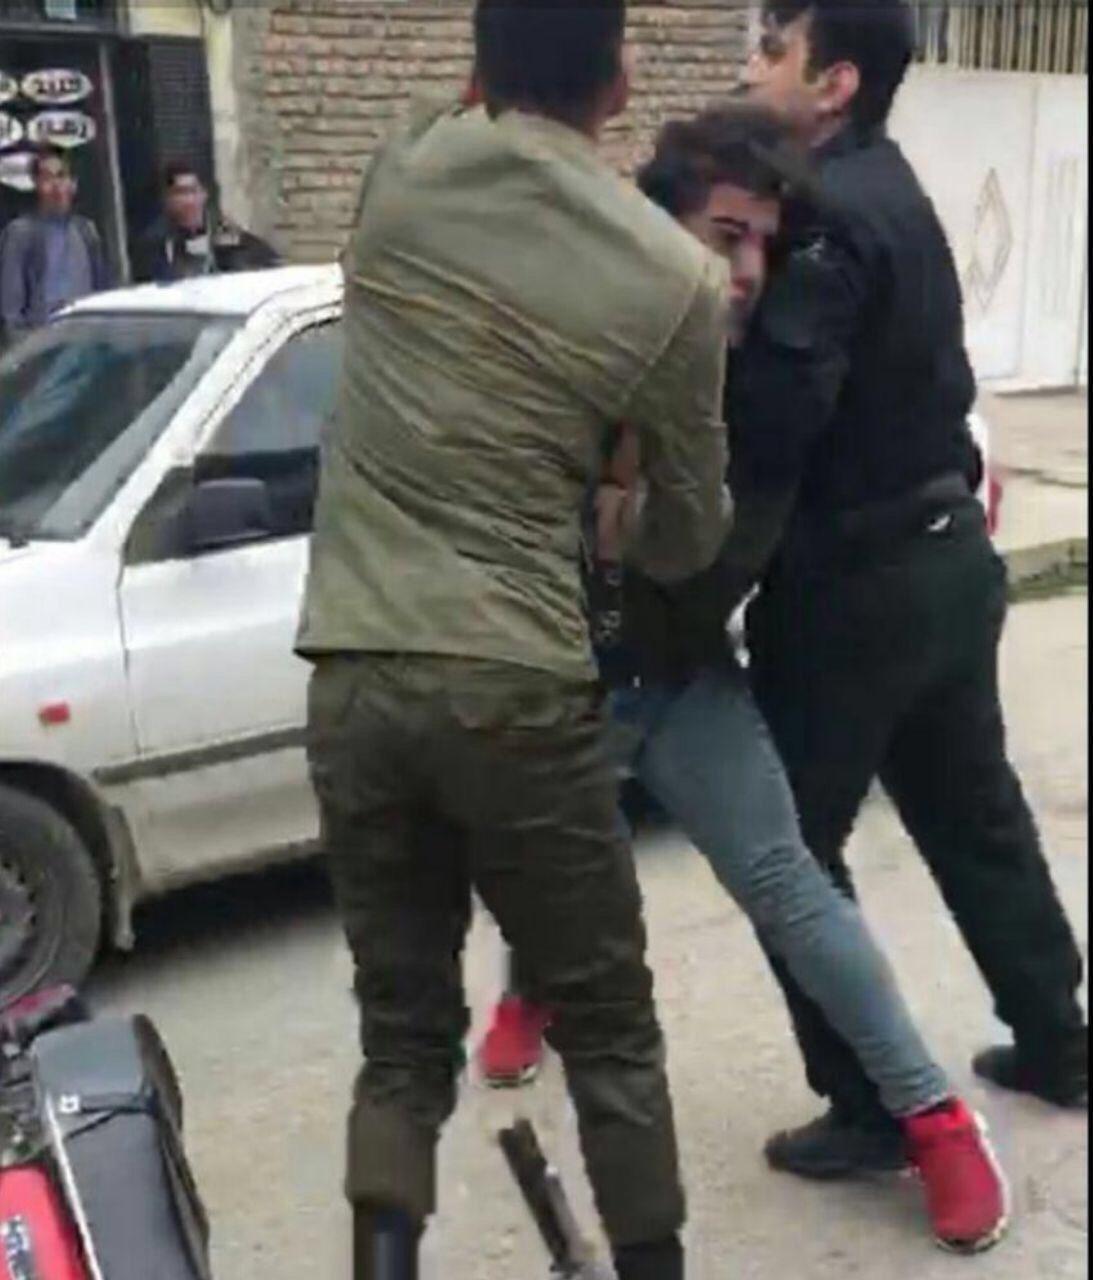 واکنش ناجا به کلیپ موتورسوار در کردکوی